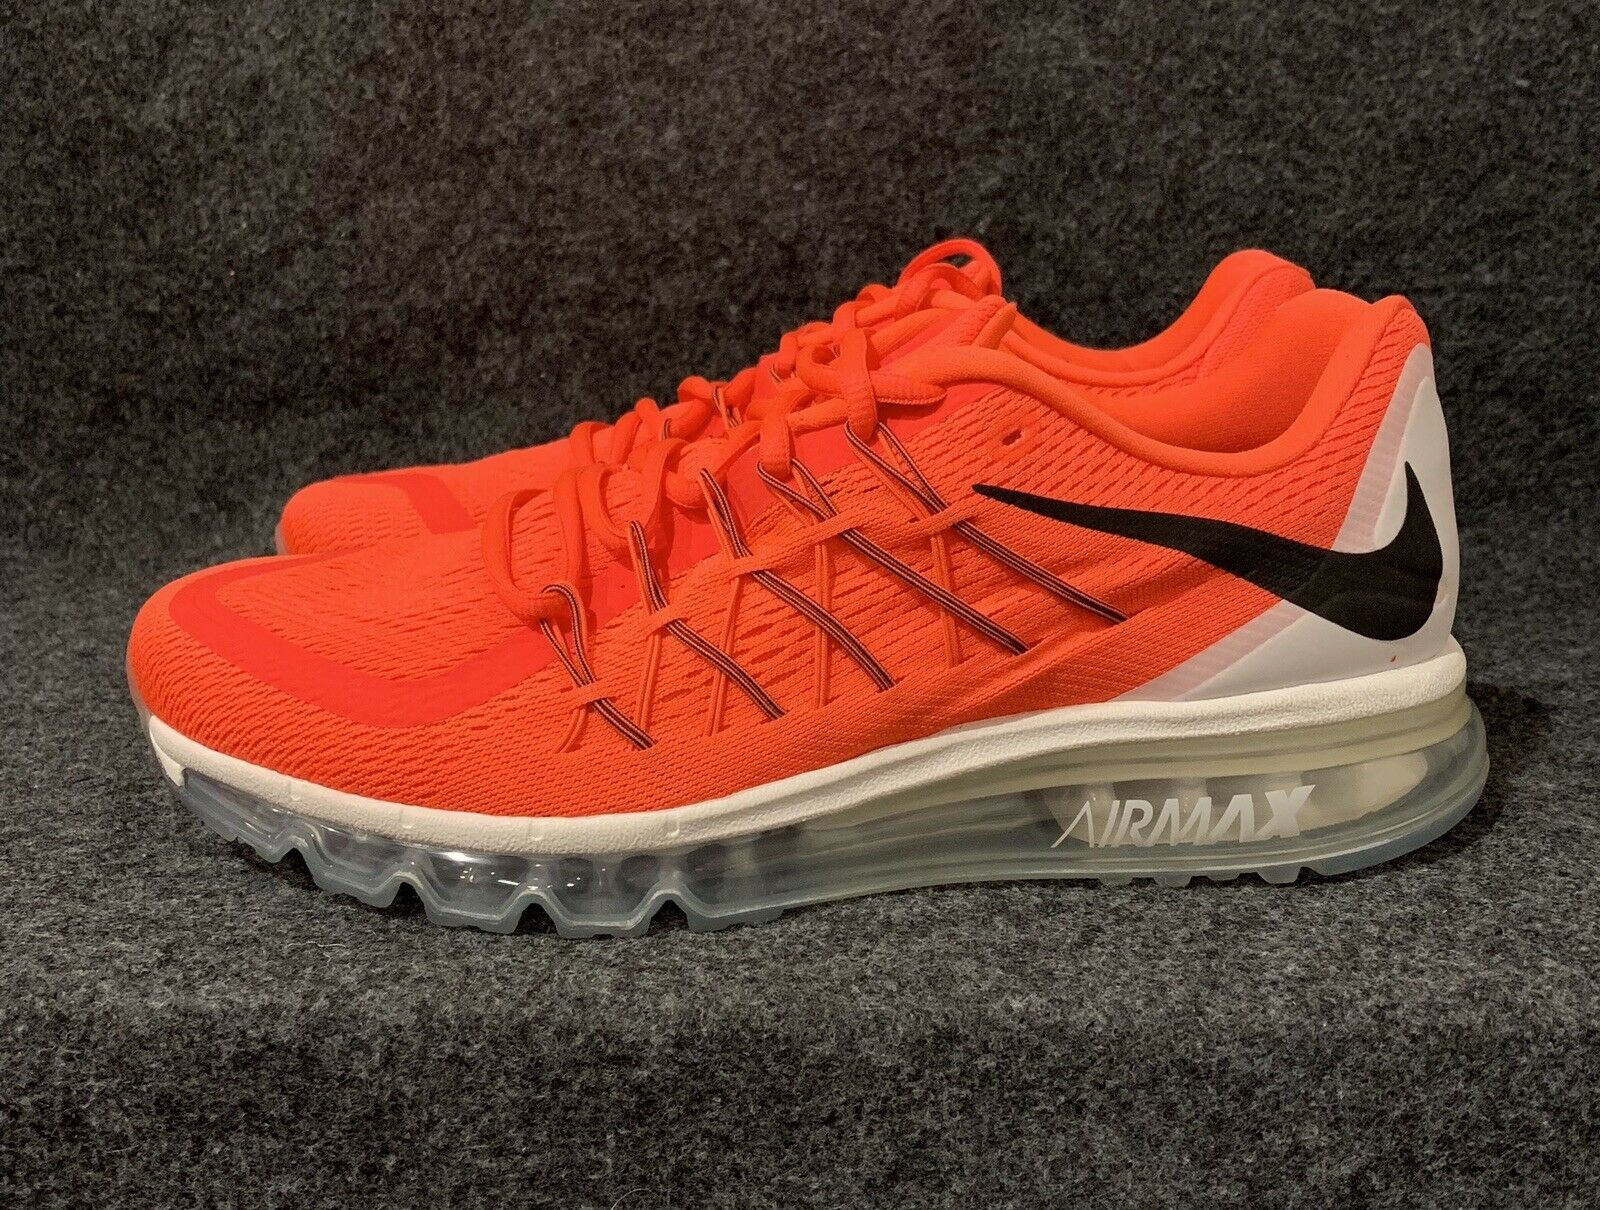 Nike Air Max 2015 Mens Running Trainers Shoes Bright Crimson Aus 11